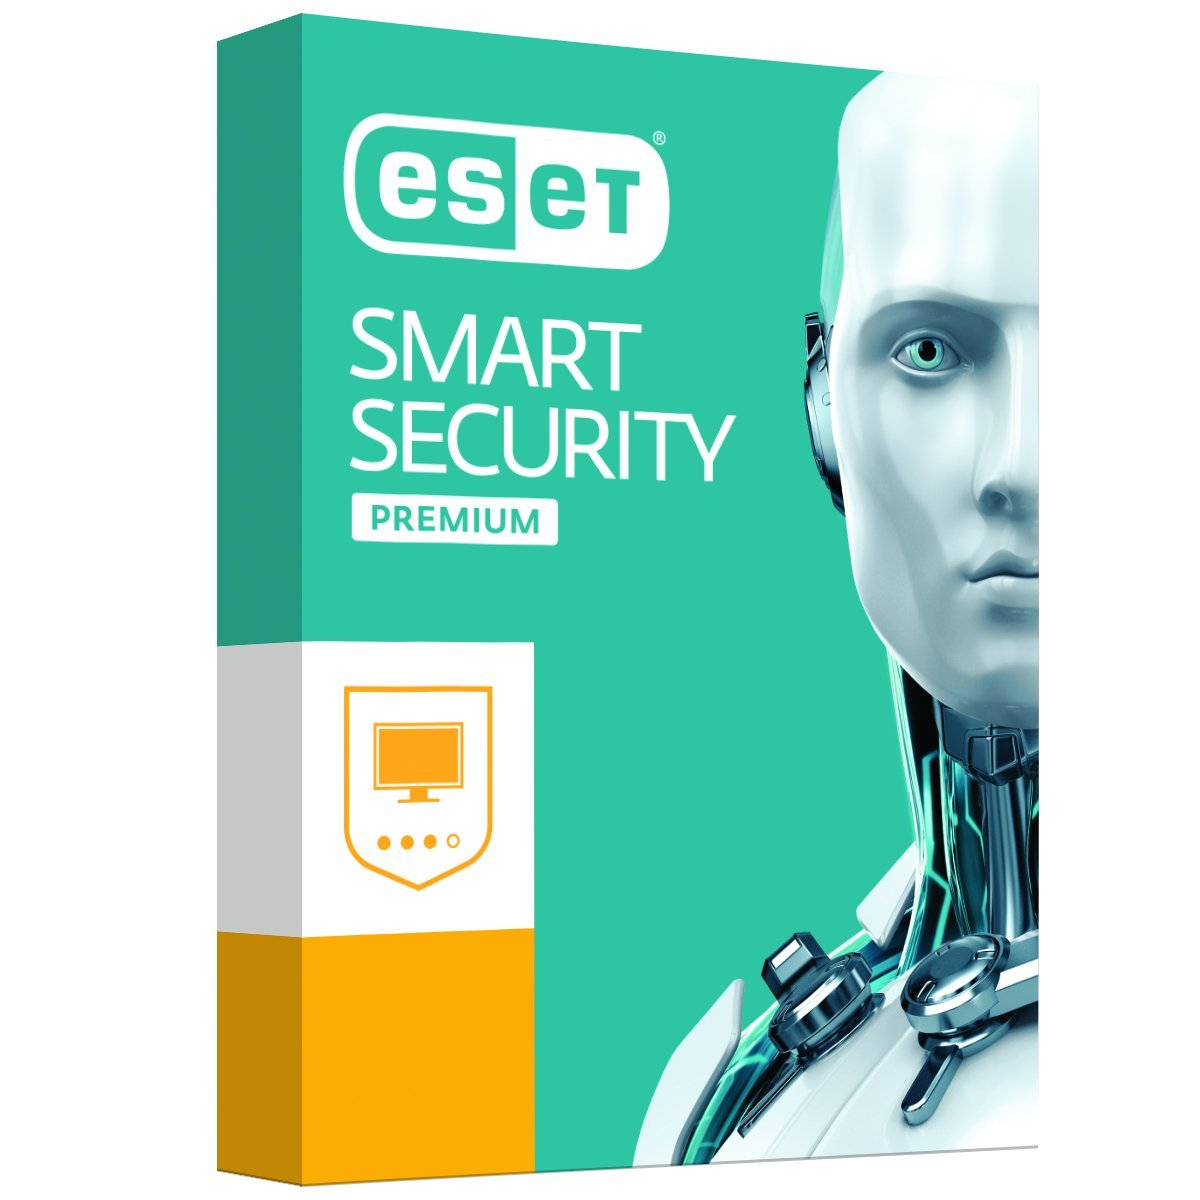 eset smart security premium 10 license keys valid 2018